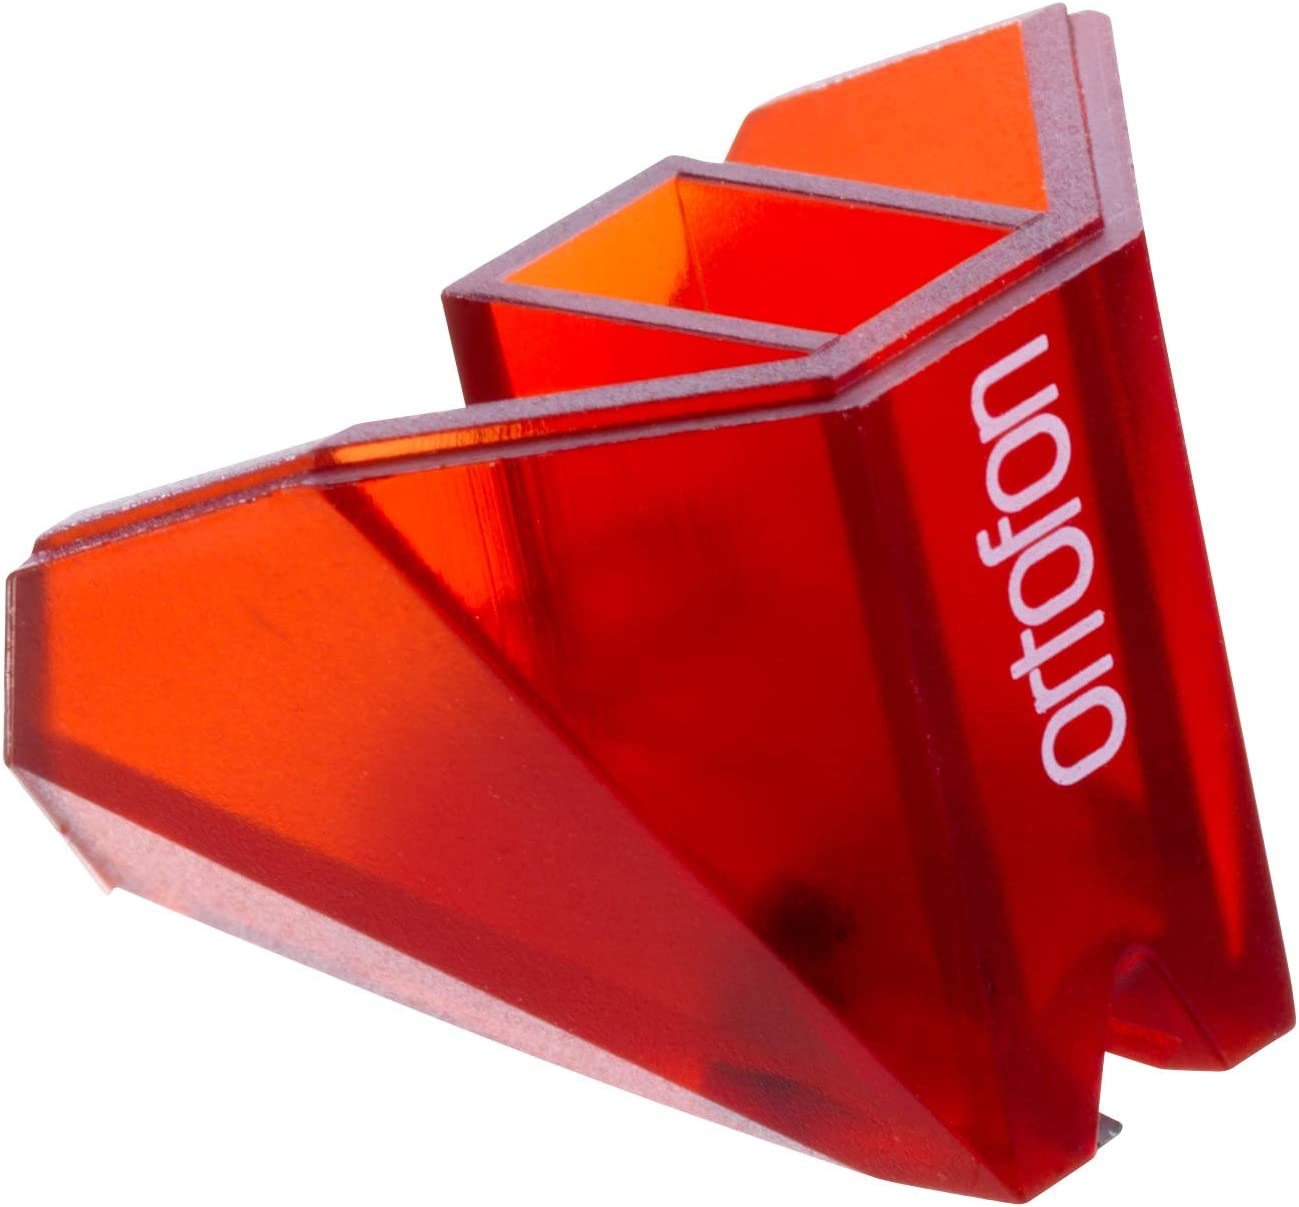 Ortofon Stylus 2M Red - Aguja: Amazon.es: Electrónica